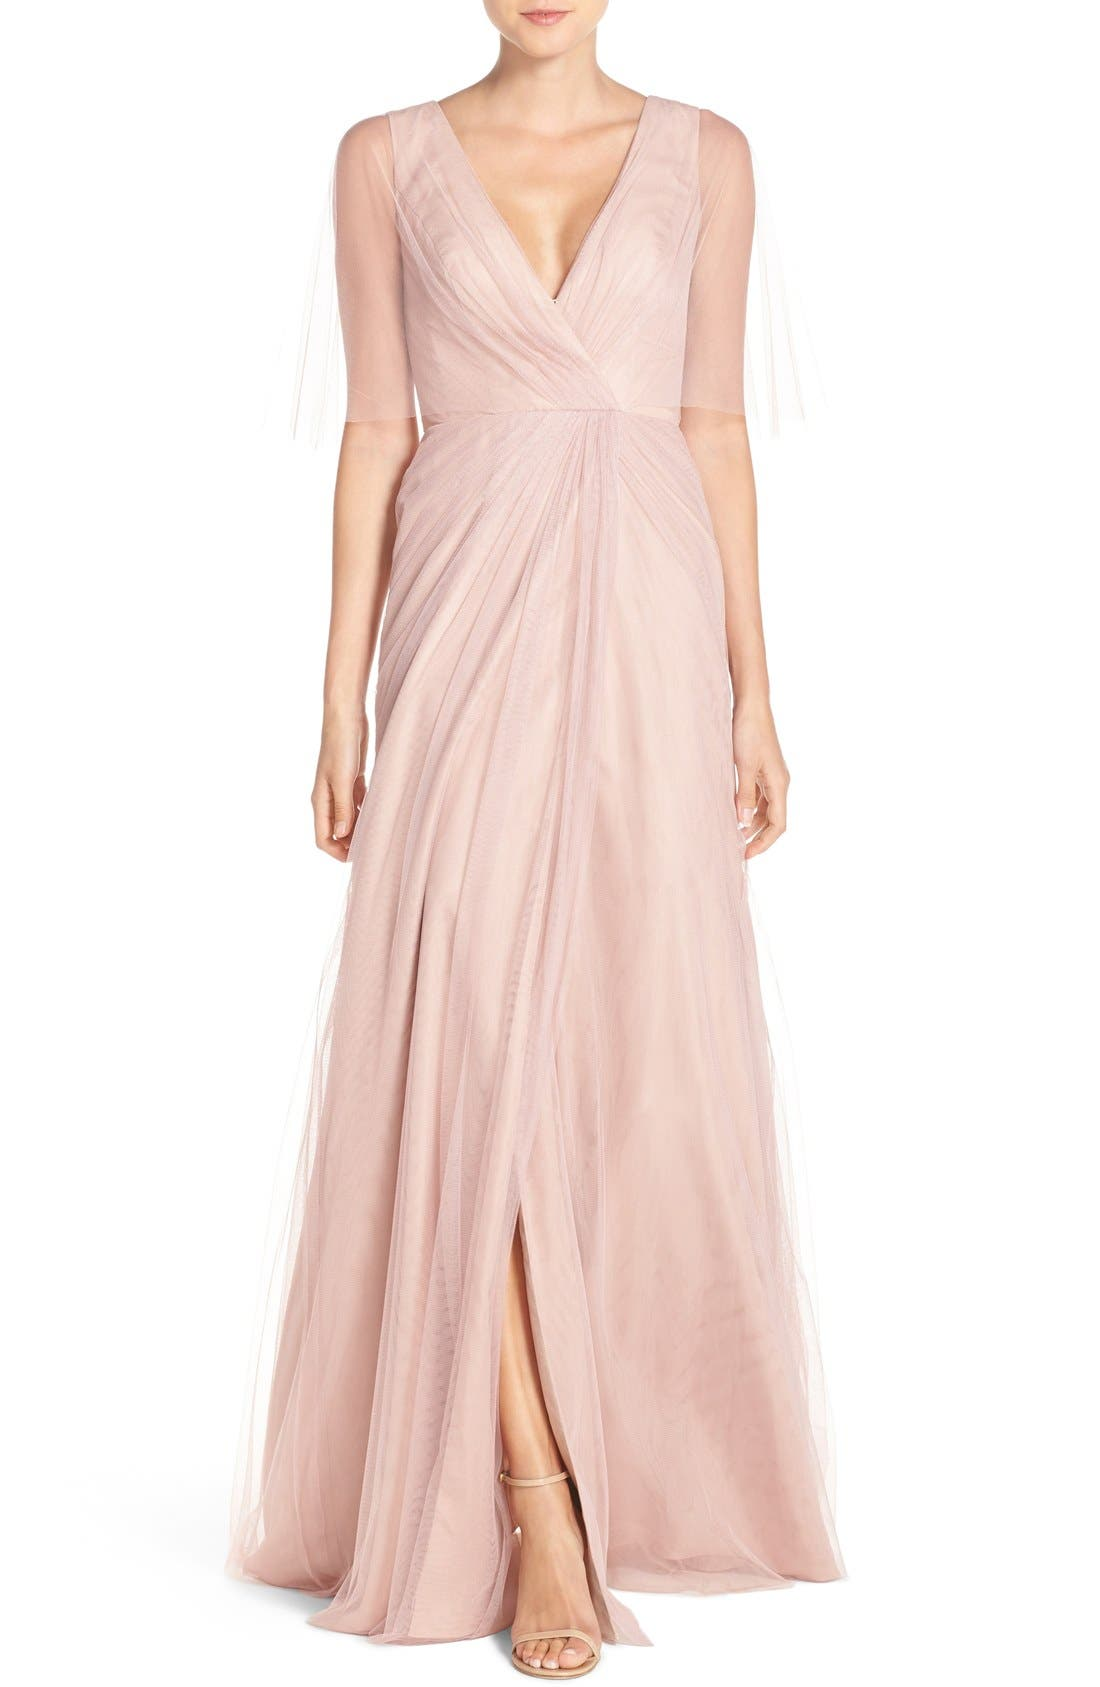 Alternate Image 1 Selected - Monique Lhuillier Bridesmaids Sheer Capelet V-Neck Tulle A-Line Gown